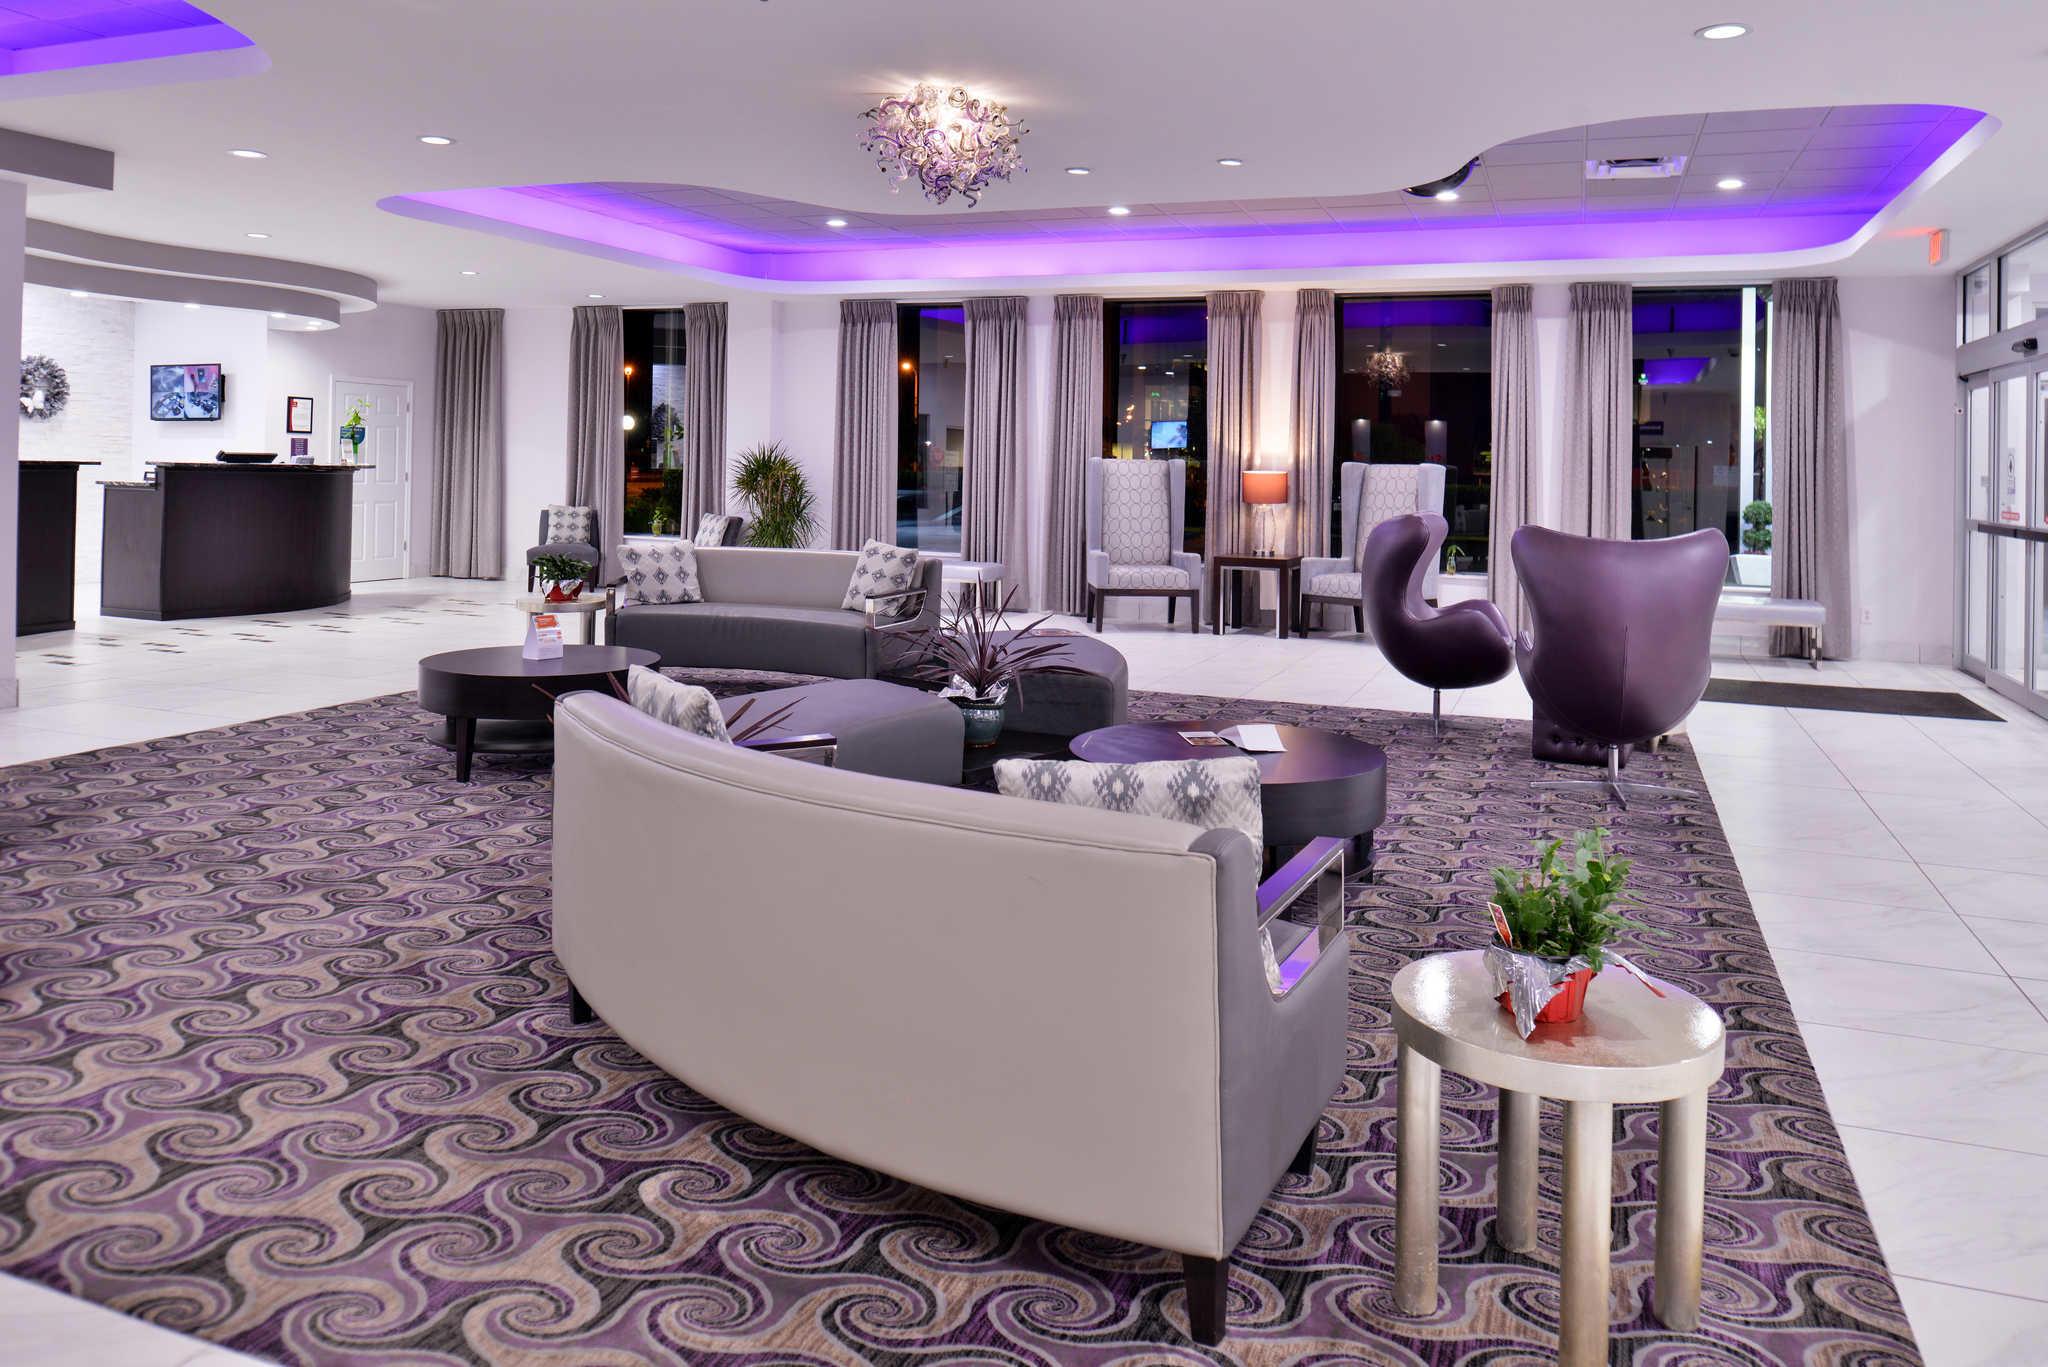 Clarion Inn & Suites Orlando near Theme Parks image 0